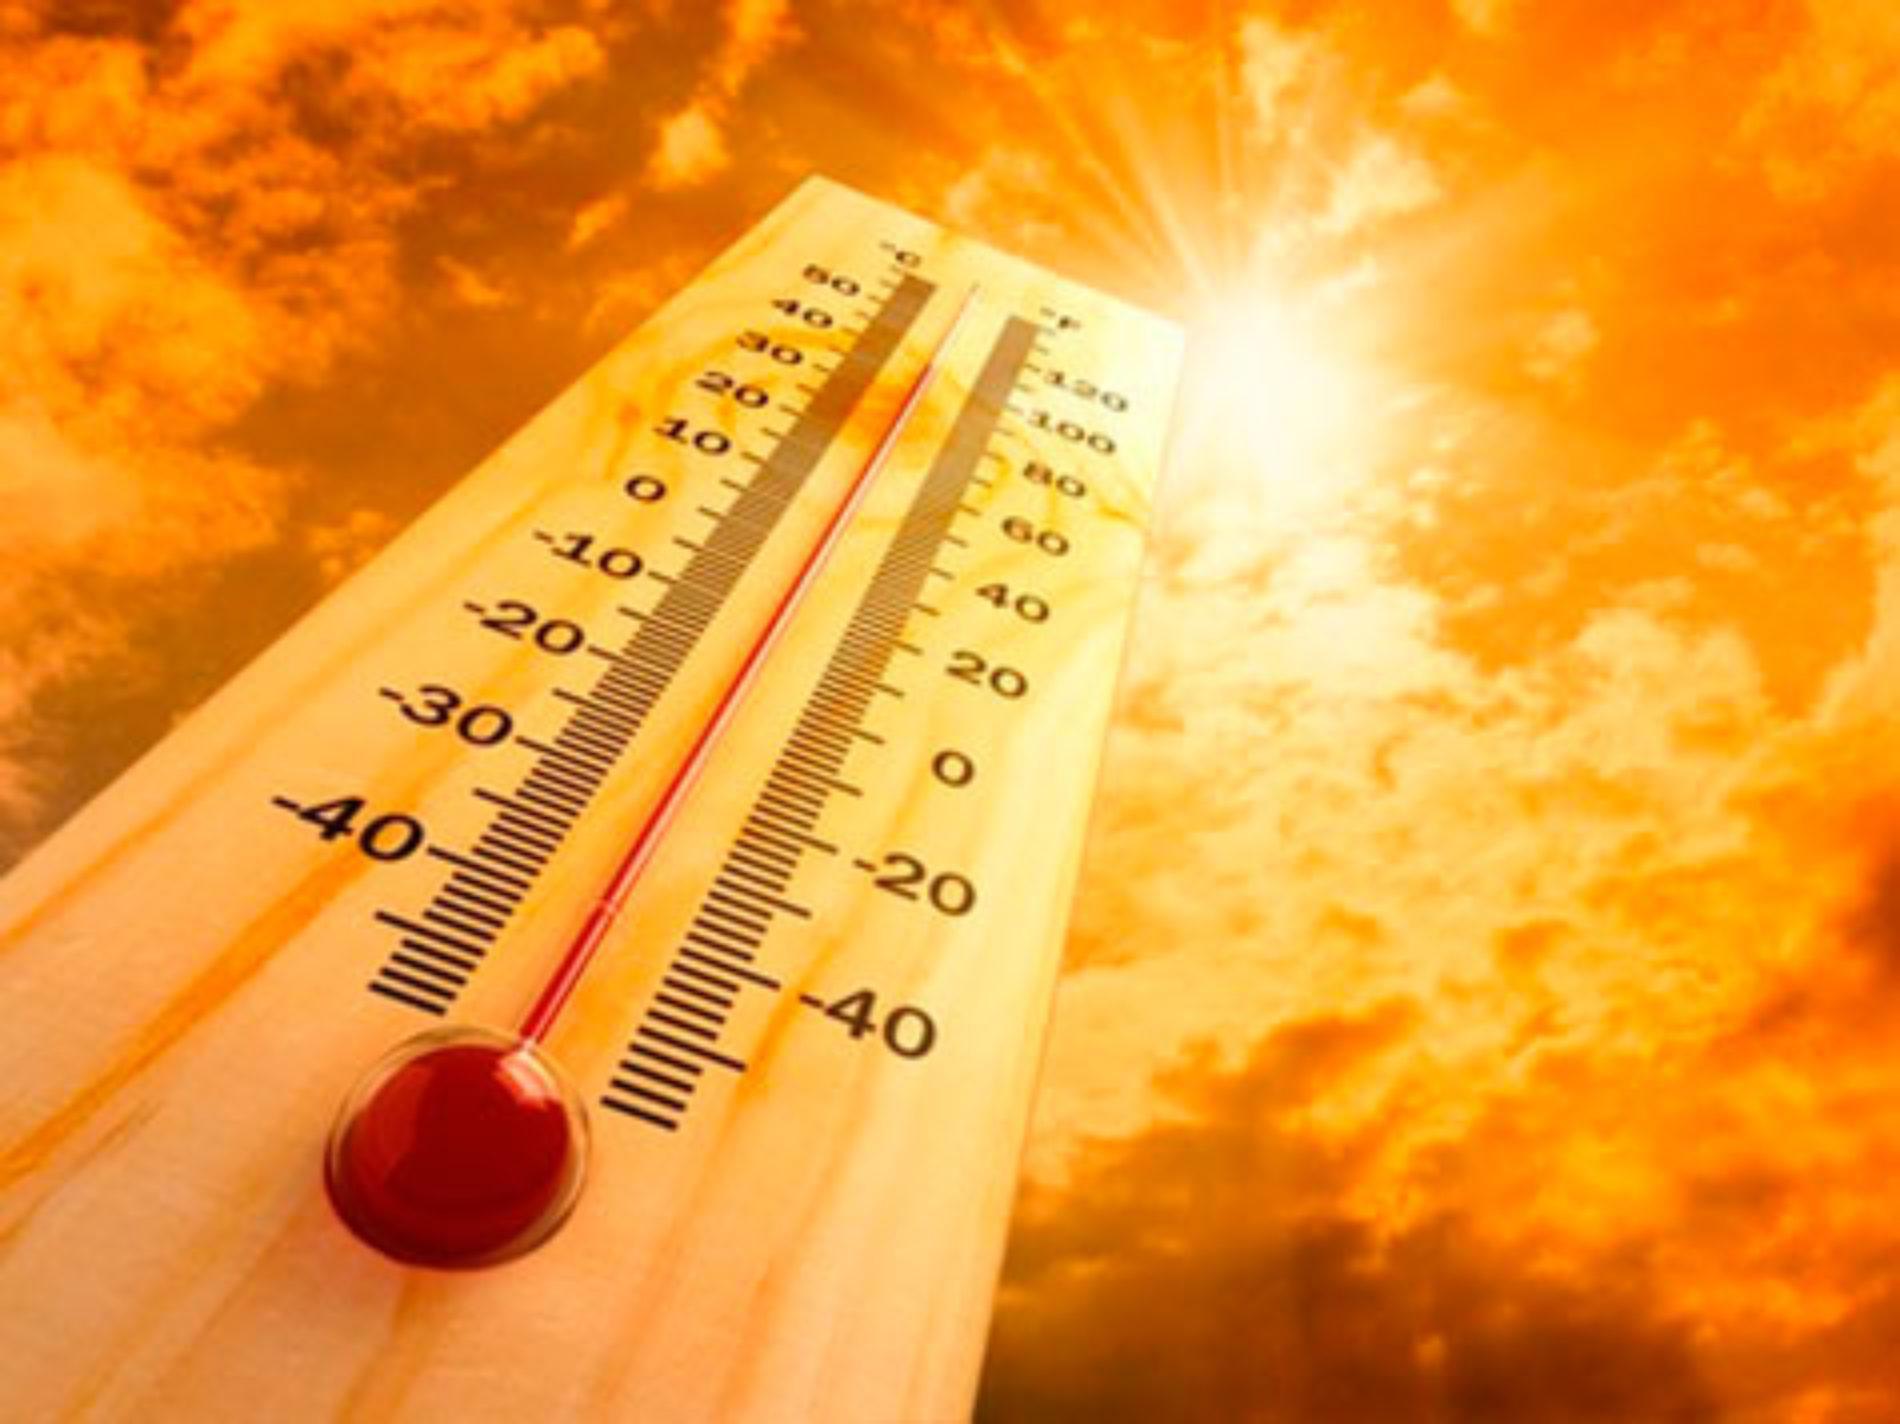 Termómetros perto dos 40 graus